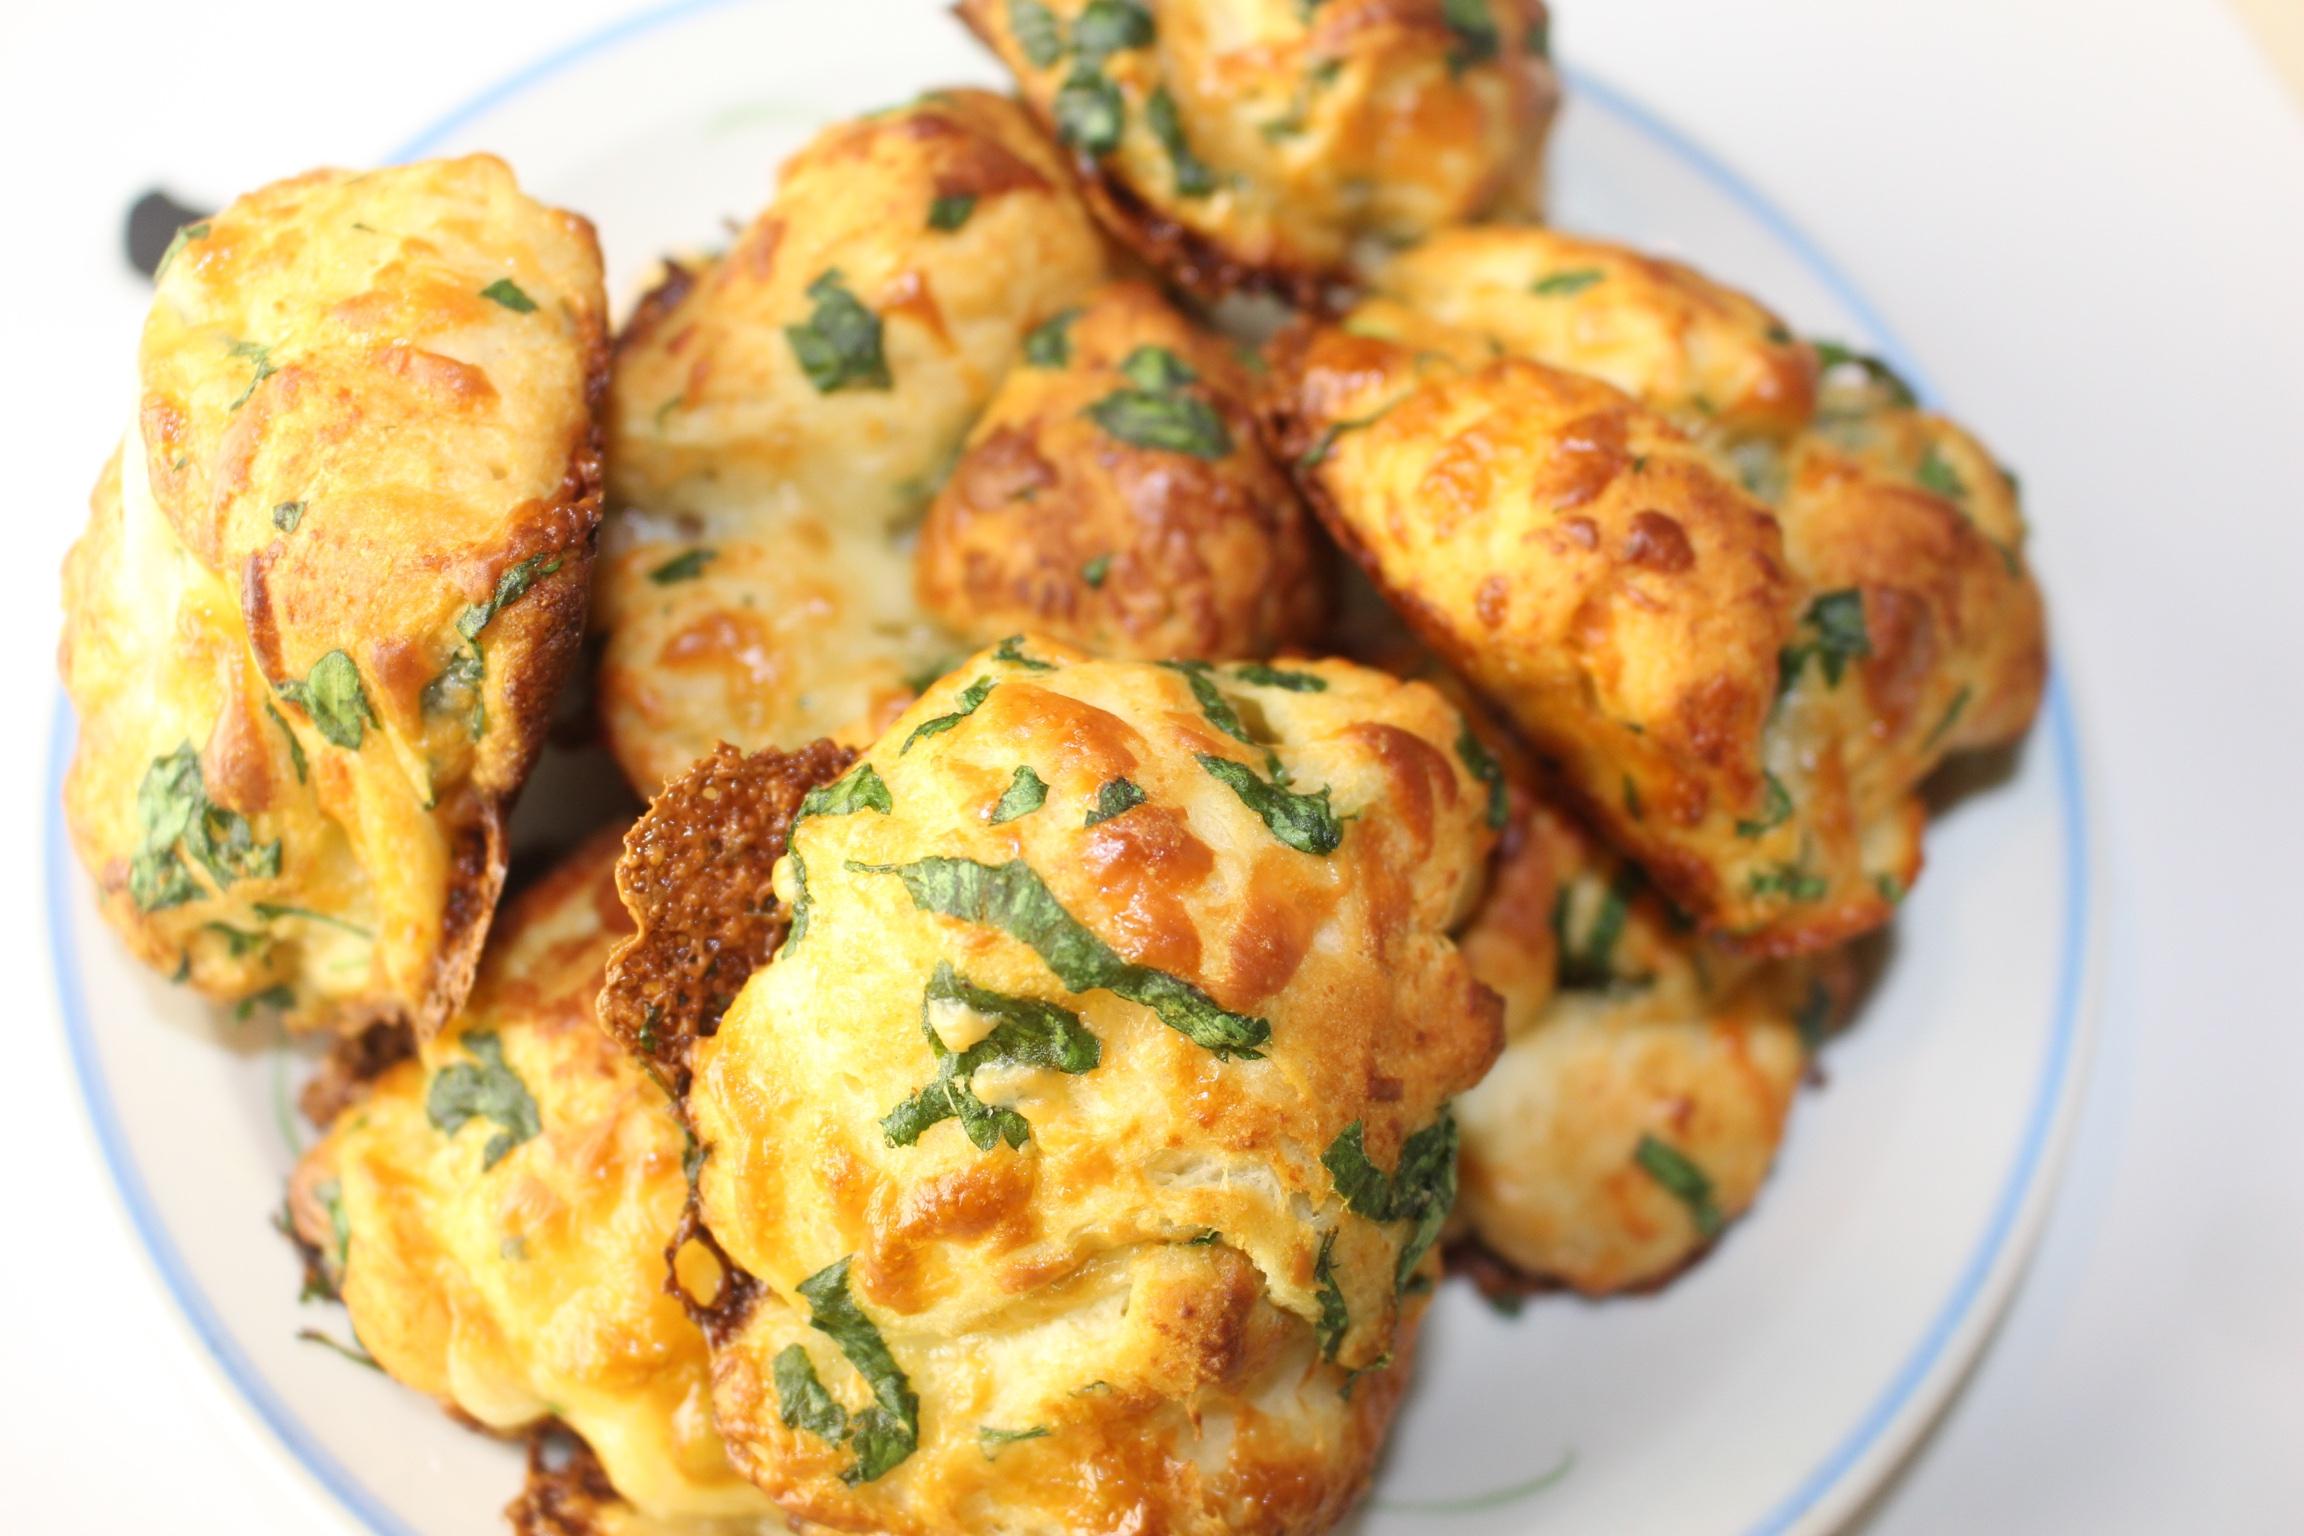 Cheesy Garlic Pull Apart Biscuits